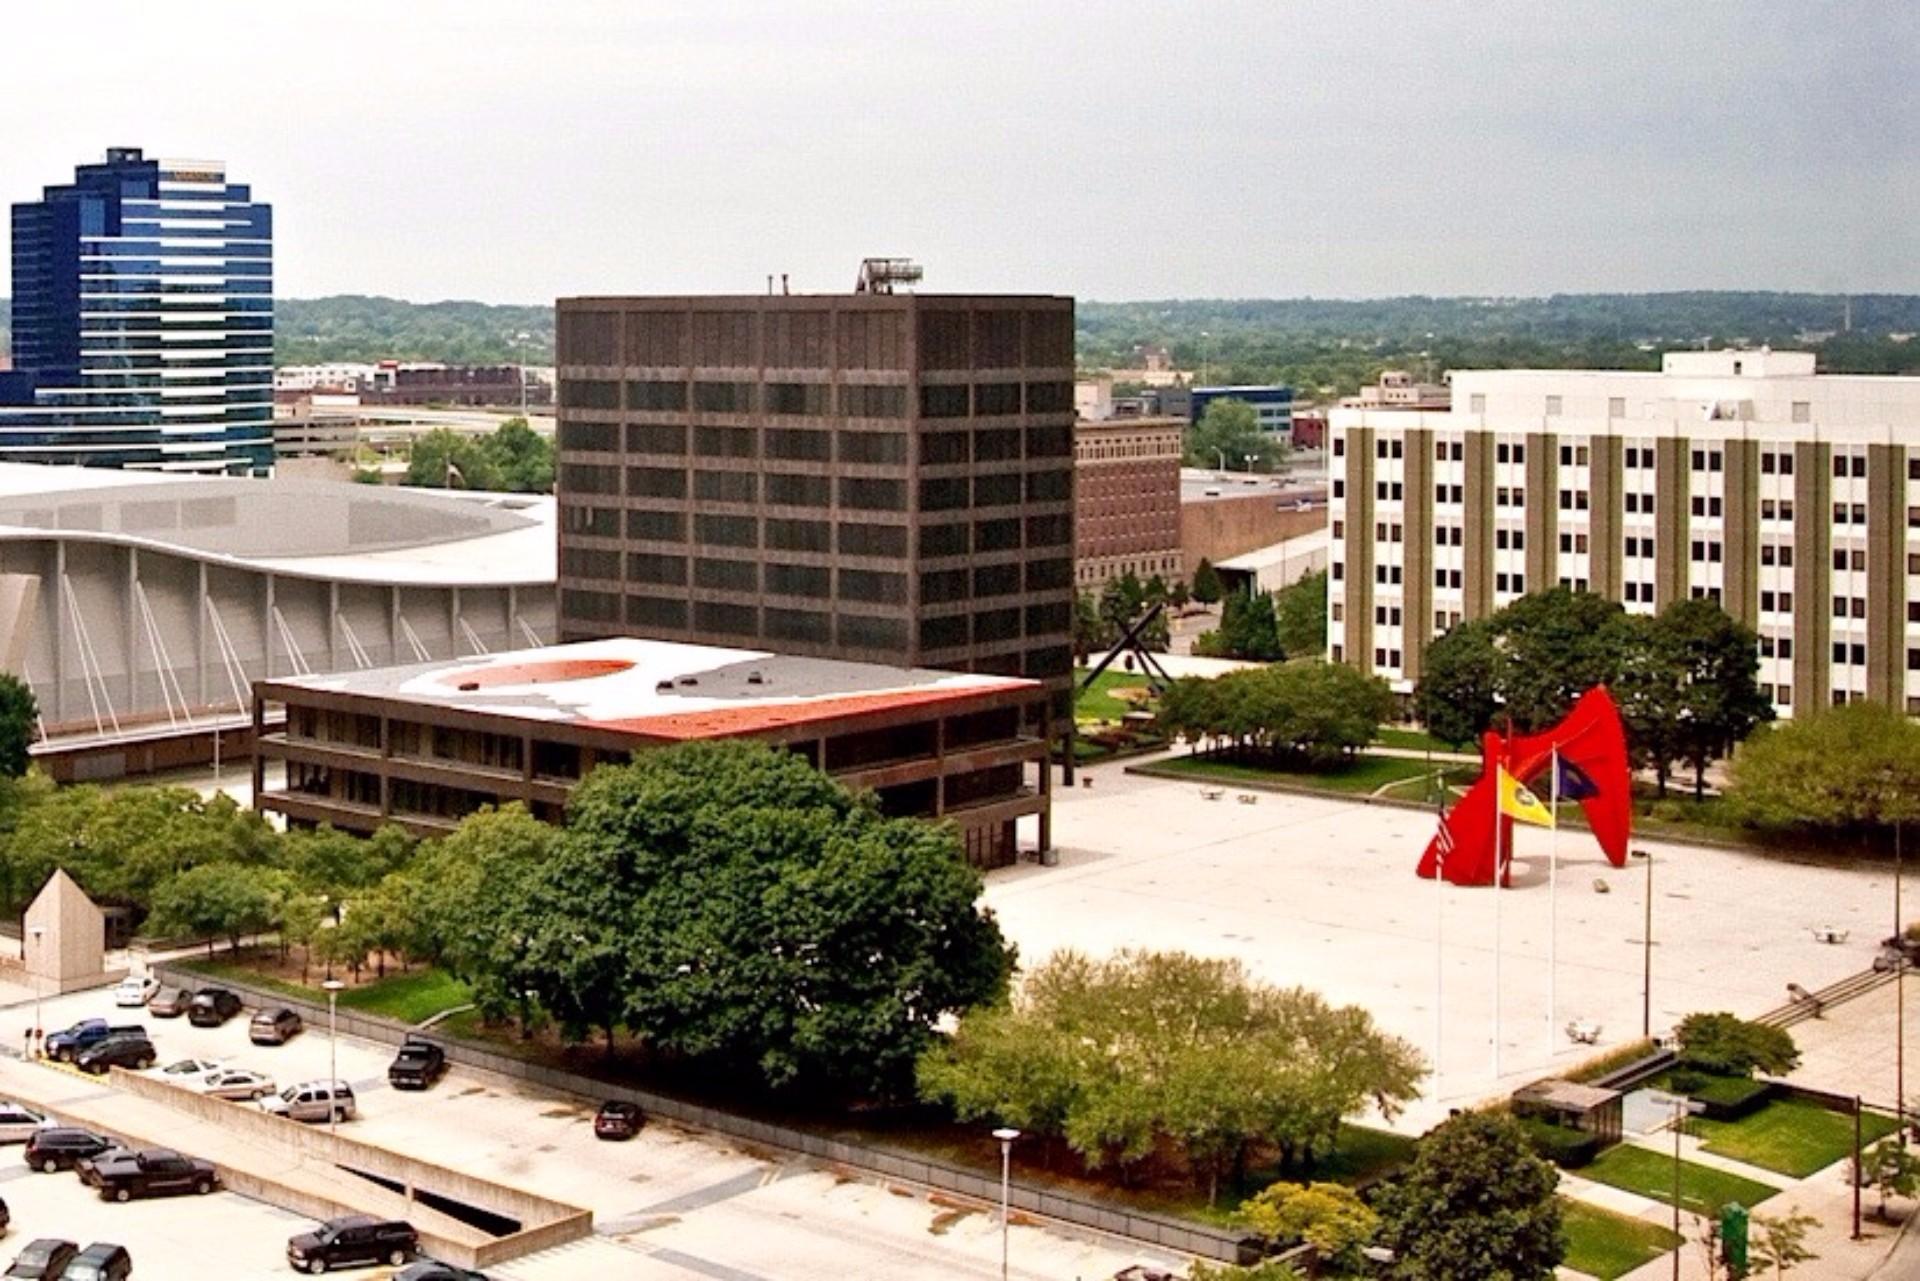 Grand Rapids Population in 2017